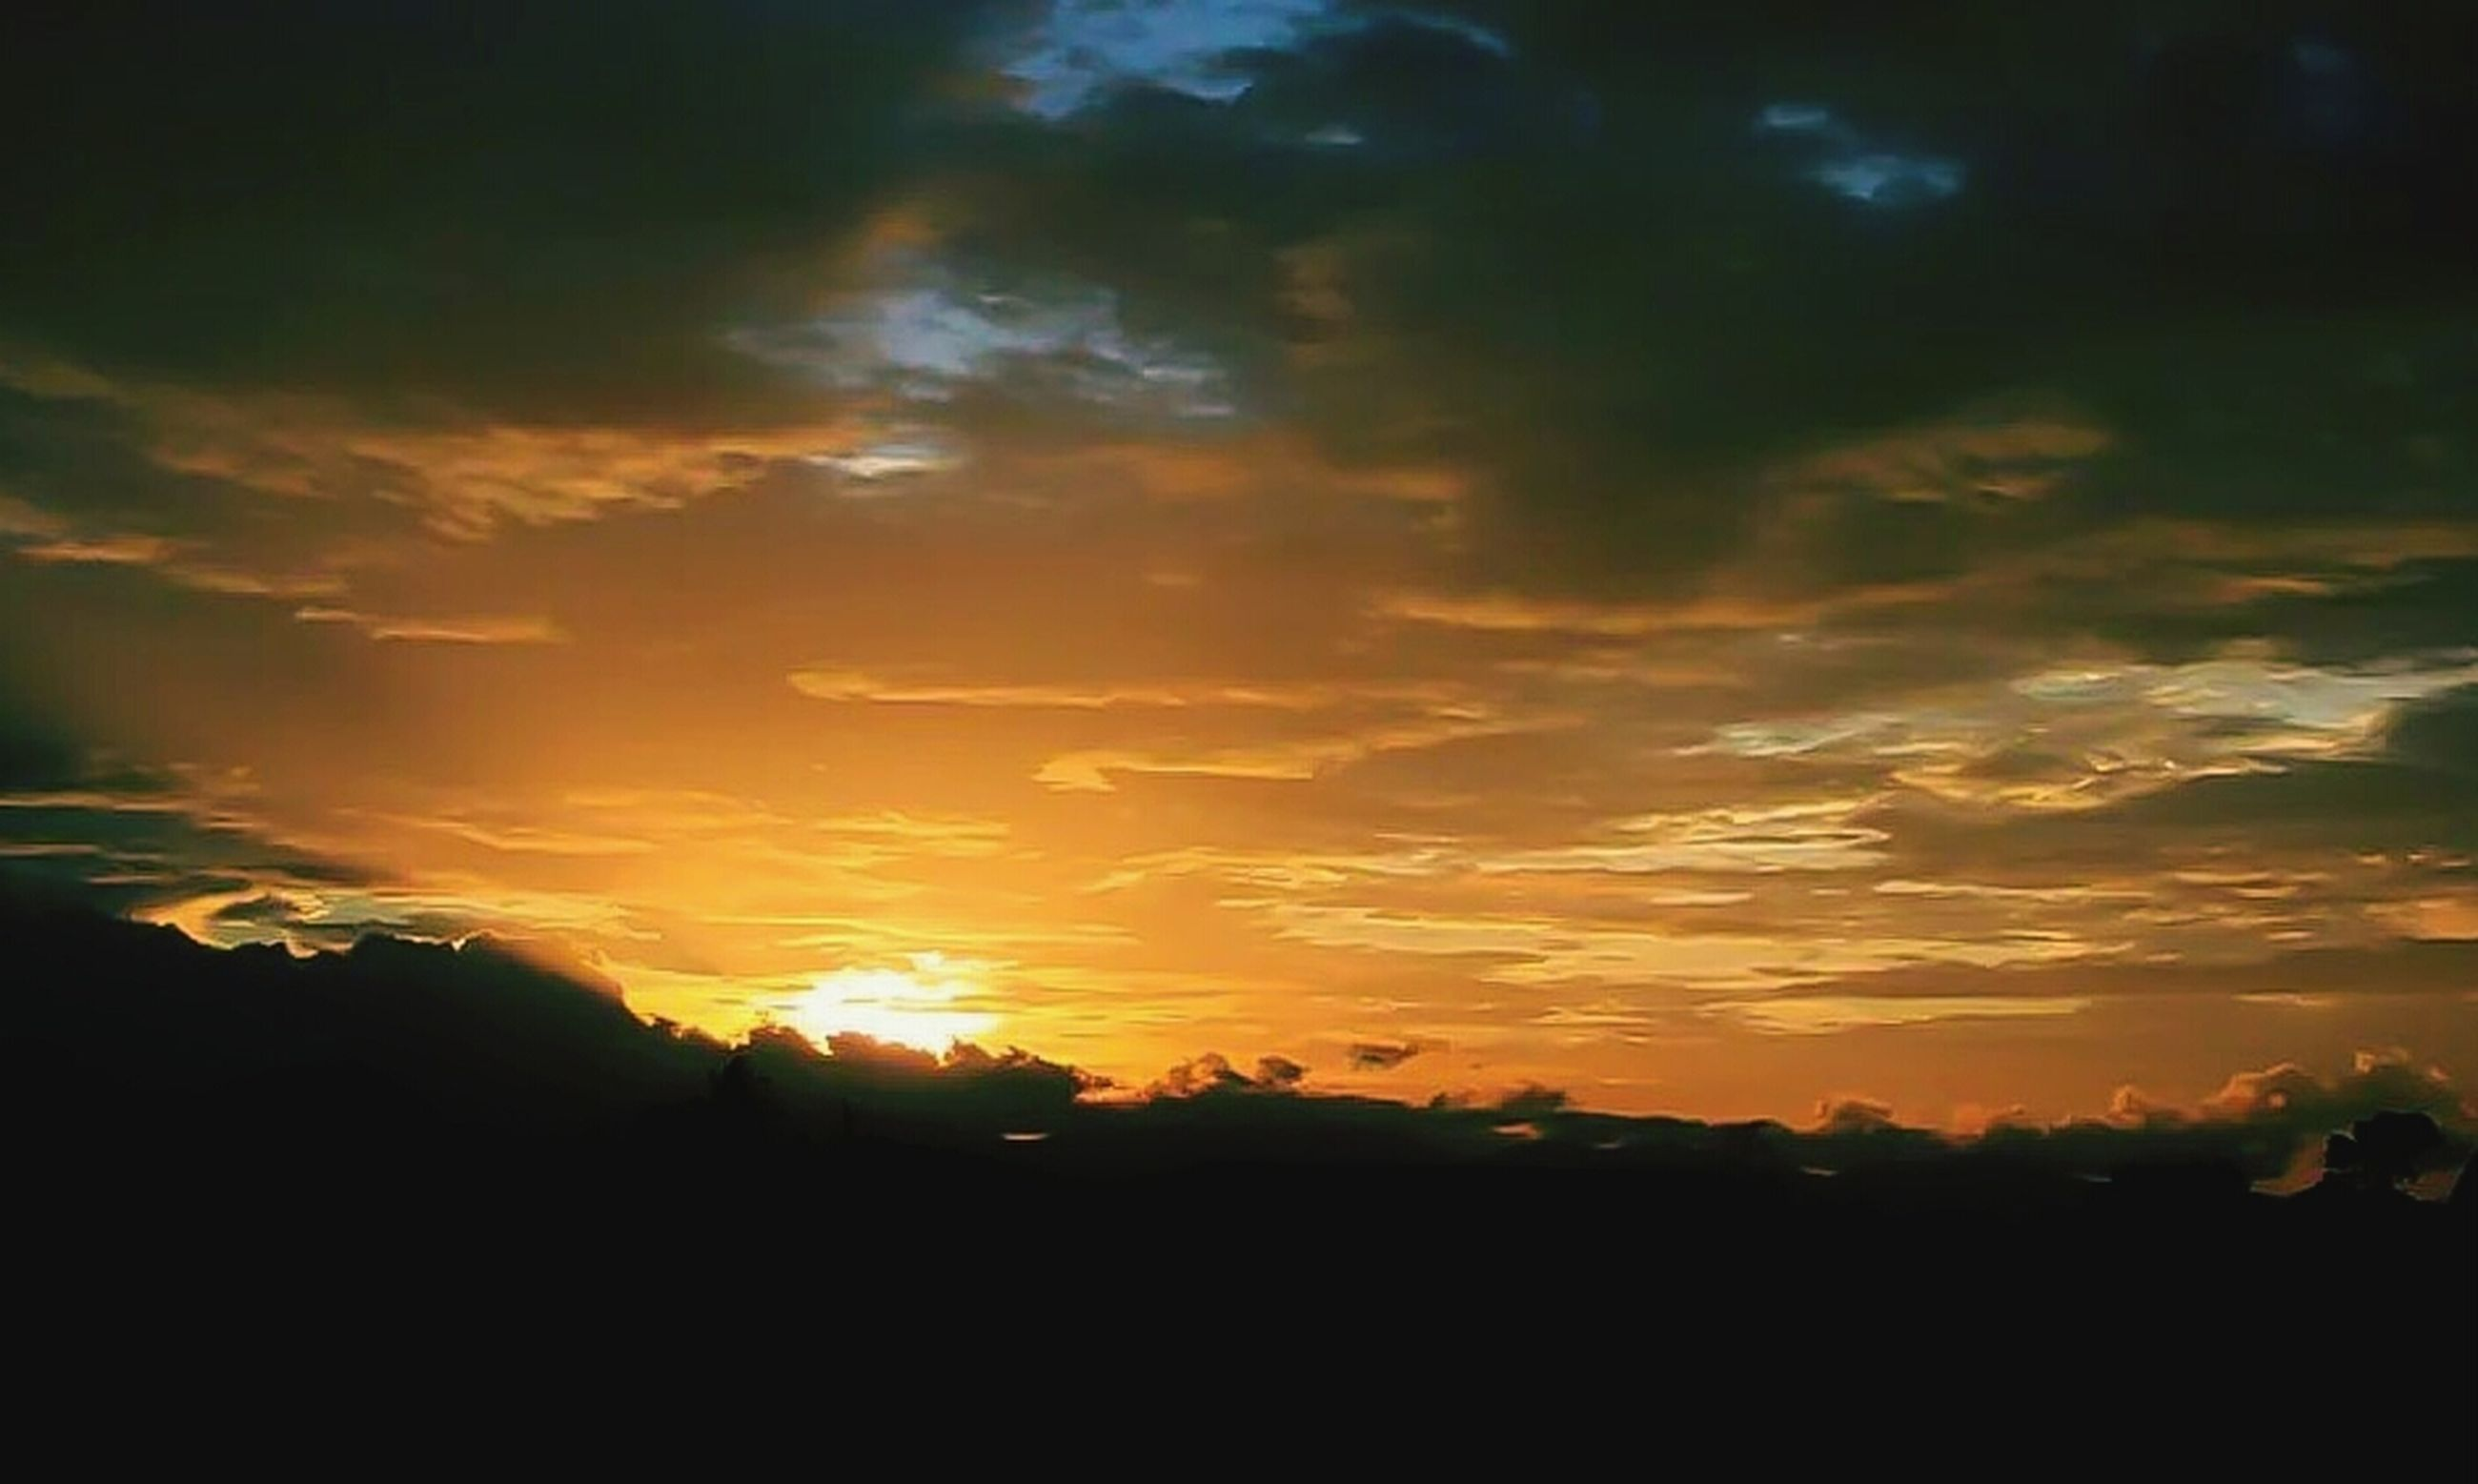 sunset, silhouette, sky, scenics, beauty in nature, tranquil scene, tranquility, cloud - sky, sun, orange color, nature, idyllic, cloud, dramatic sky, landscape, sunlight, tree, dark, cloudy, outdoors